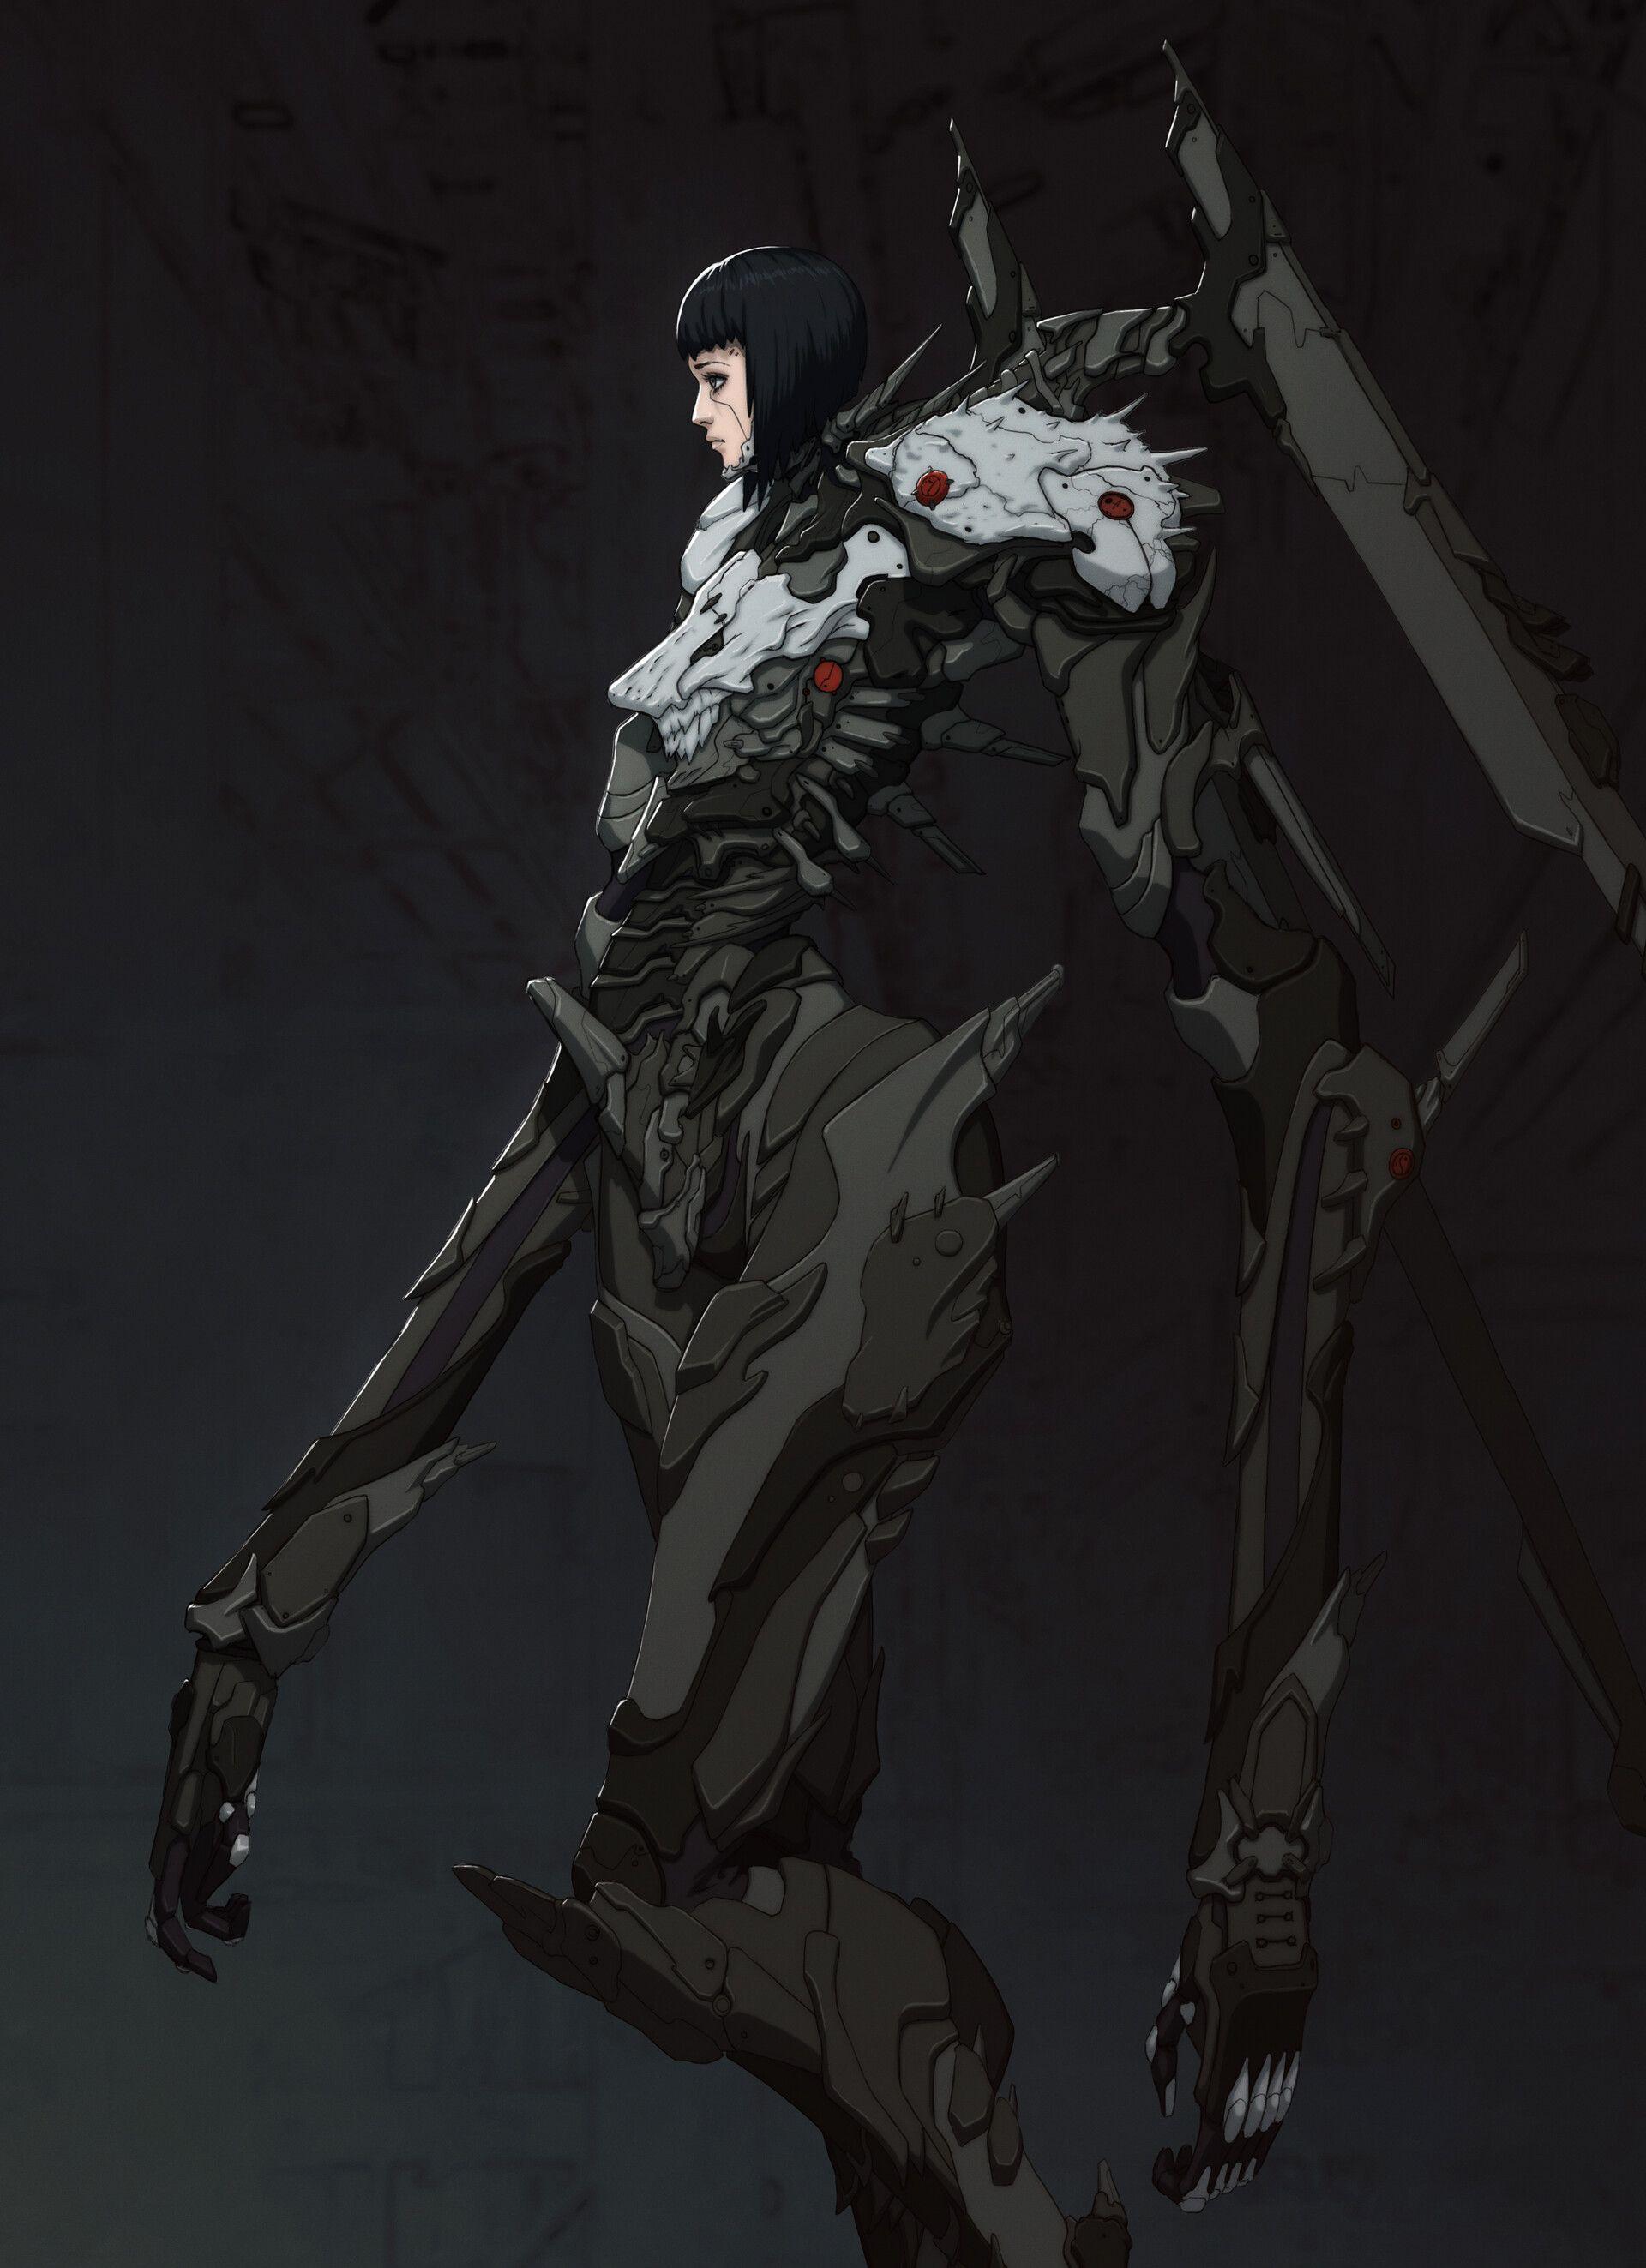 ArtStation 15, Ujin Shamoney Concept art characters